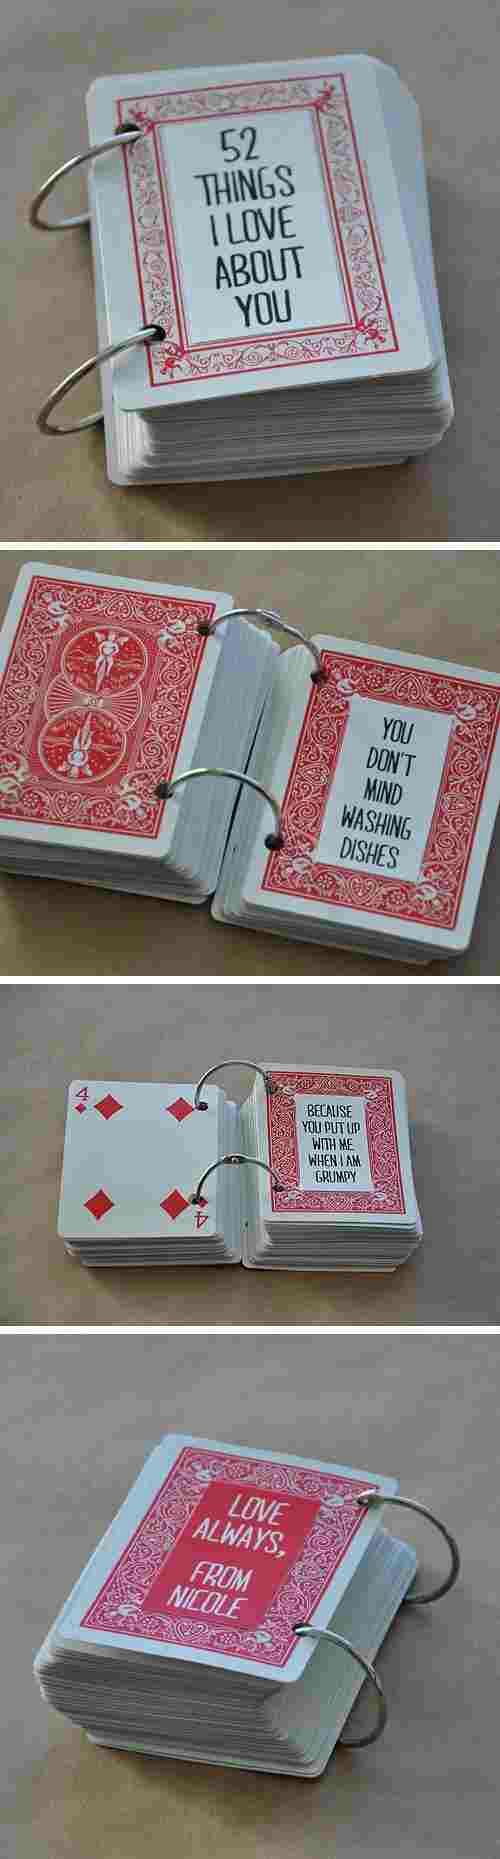 cute Valentine's day gift